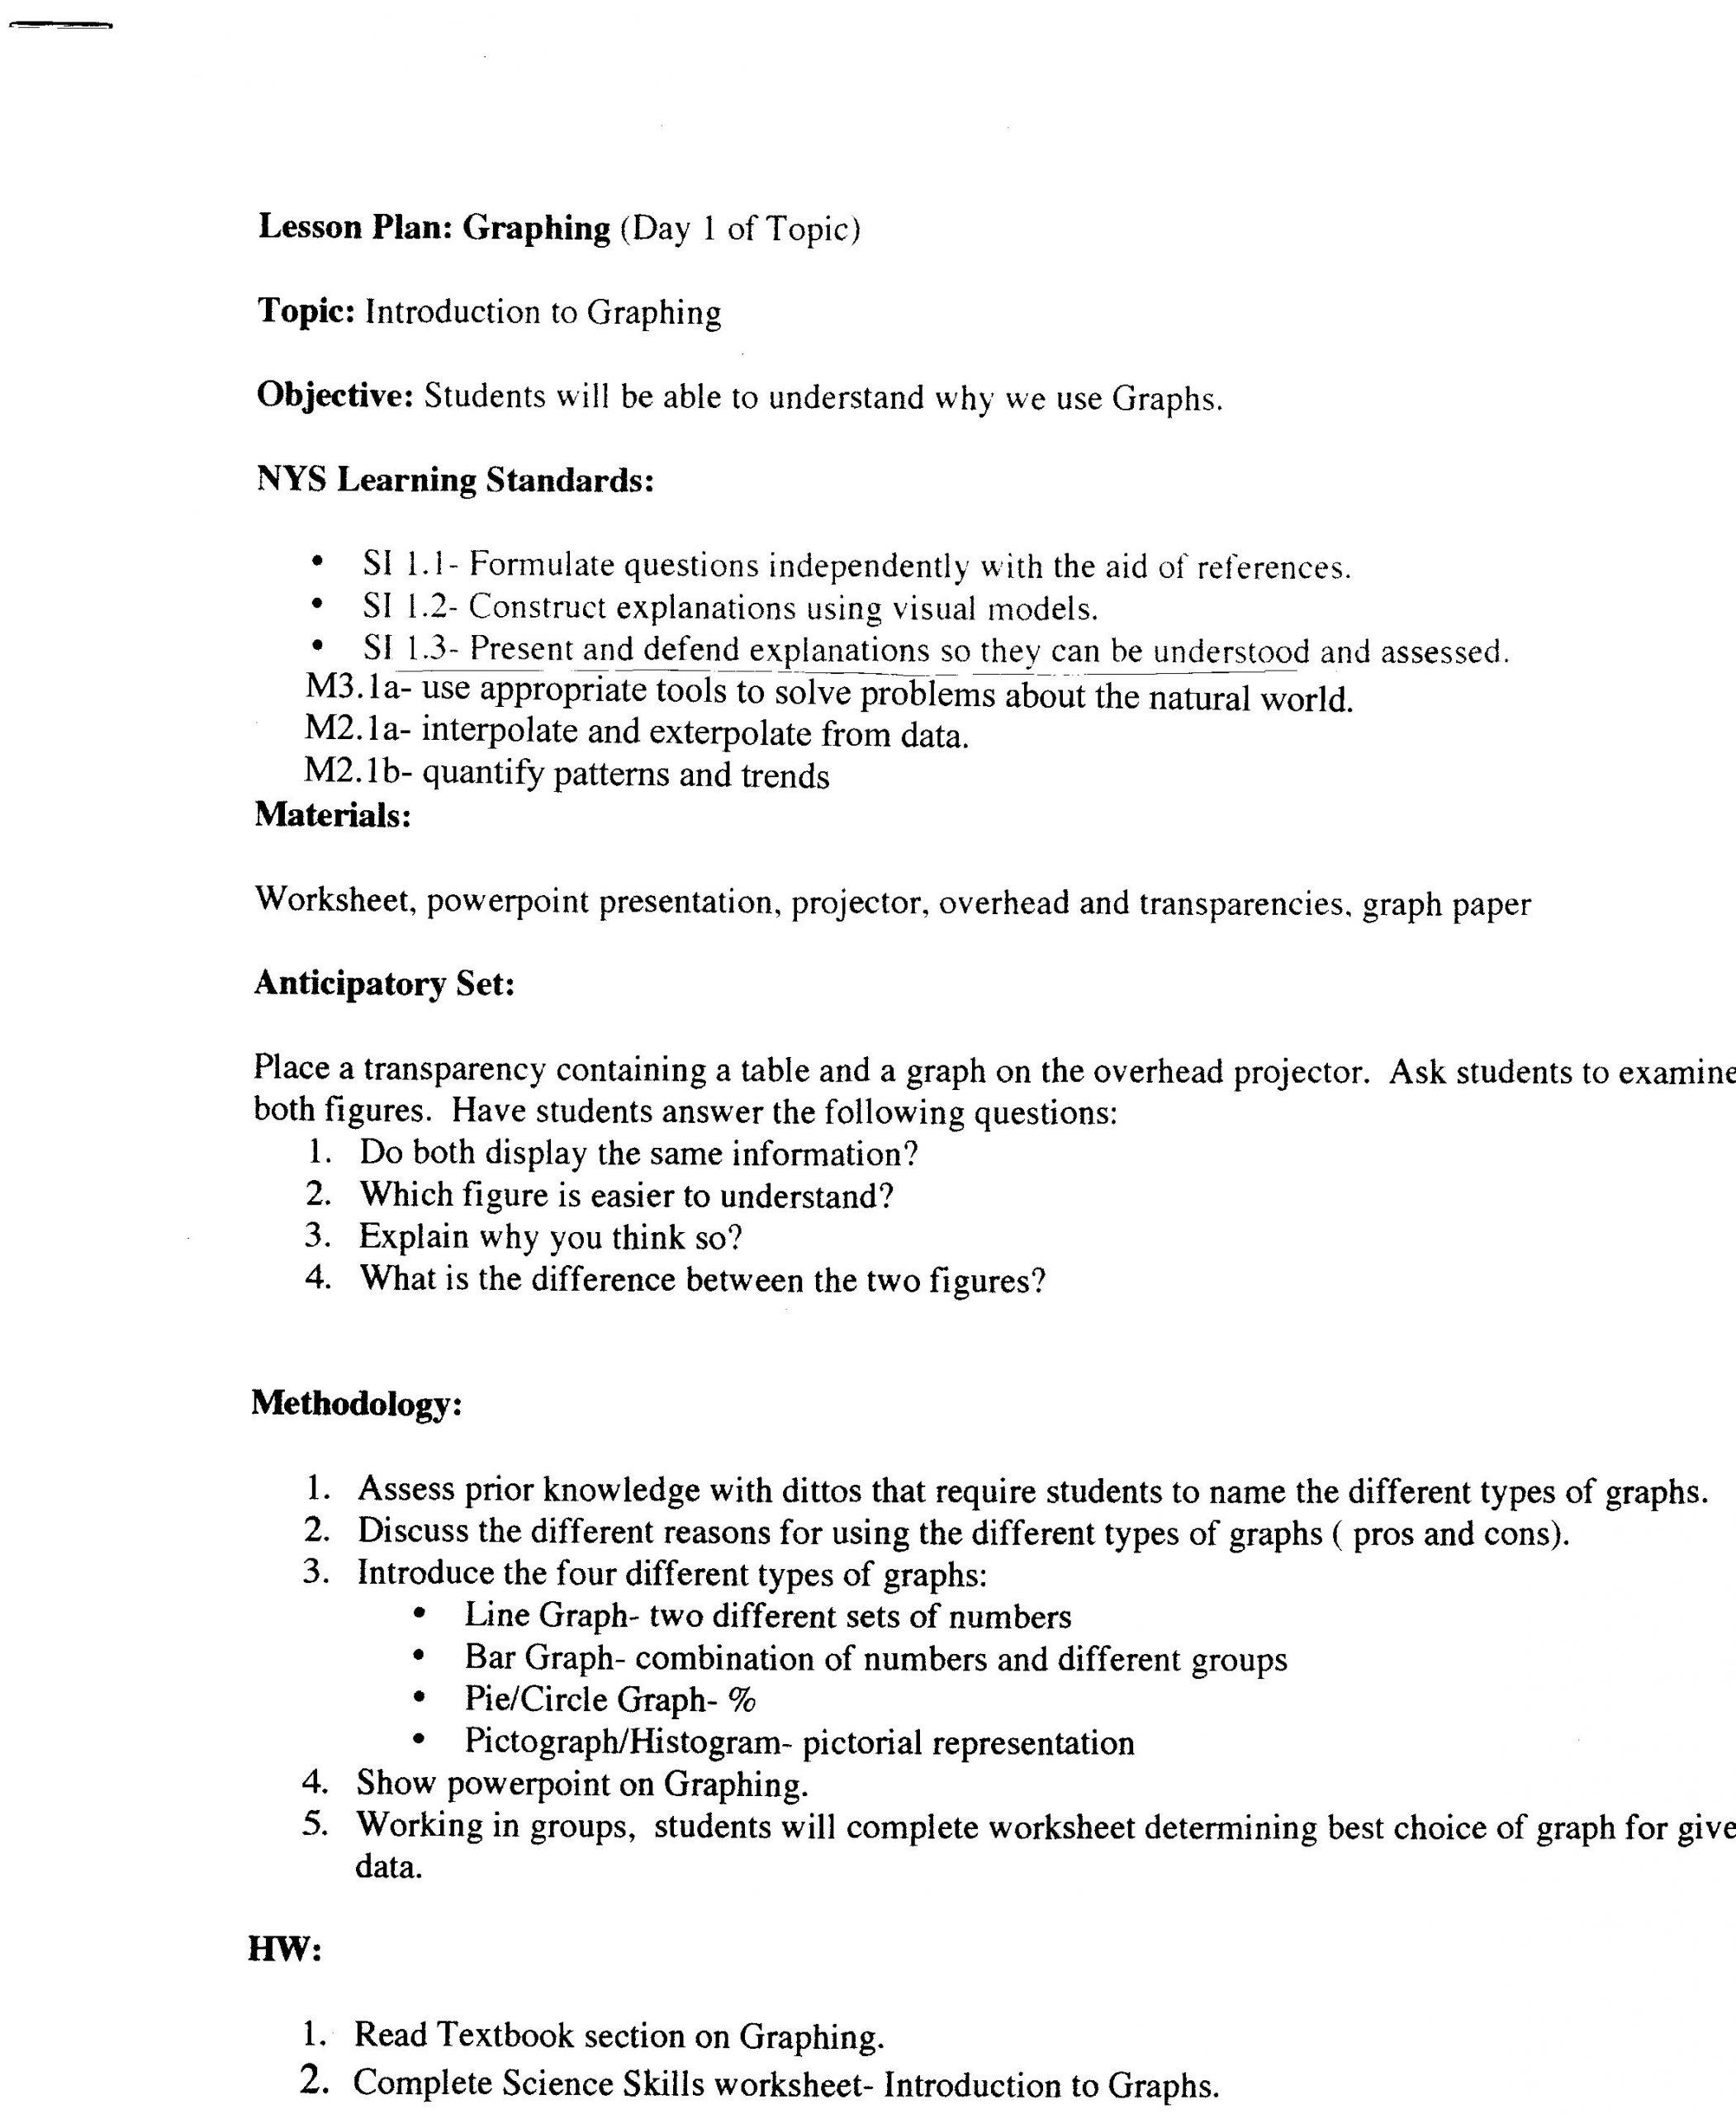 Triple Beam Balance Practice Worksheet Science Skills